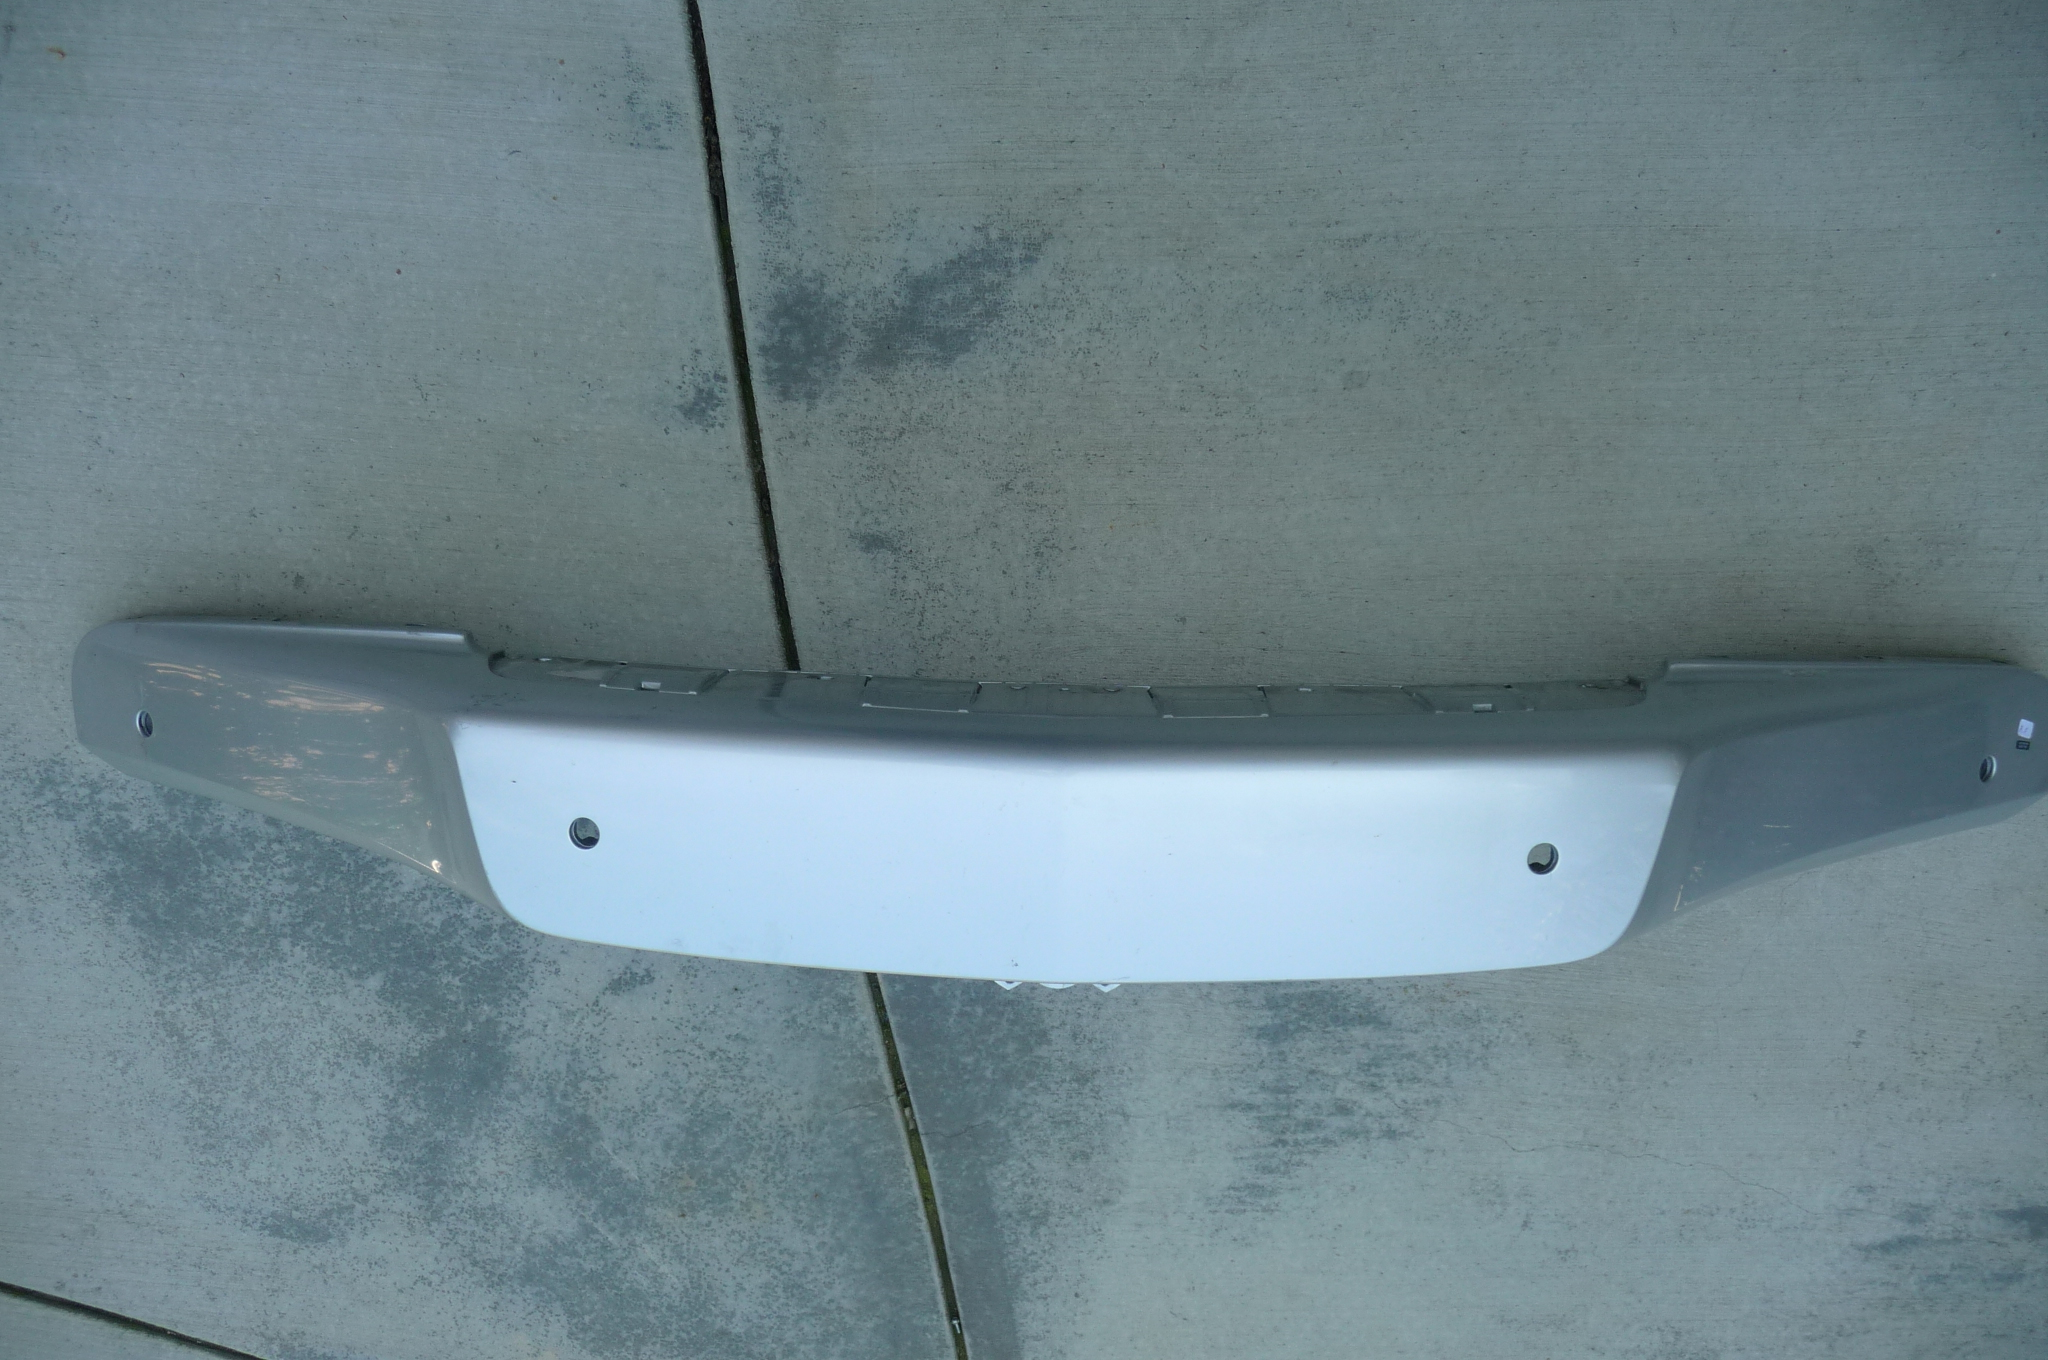 Bentley Mulsanne Upper Front Bumper Cover 3Y0807248 - Used Auto Parts Store | LA Global Parts